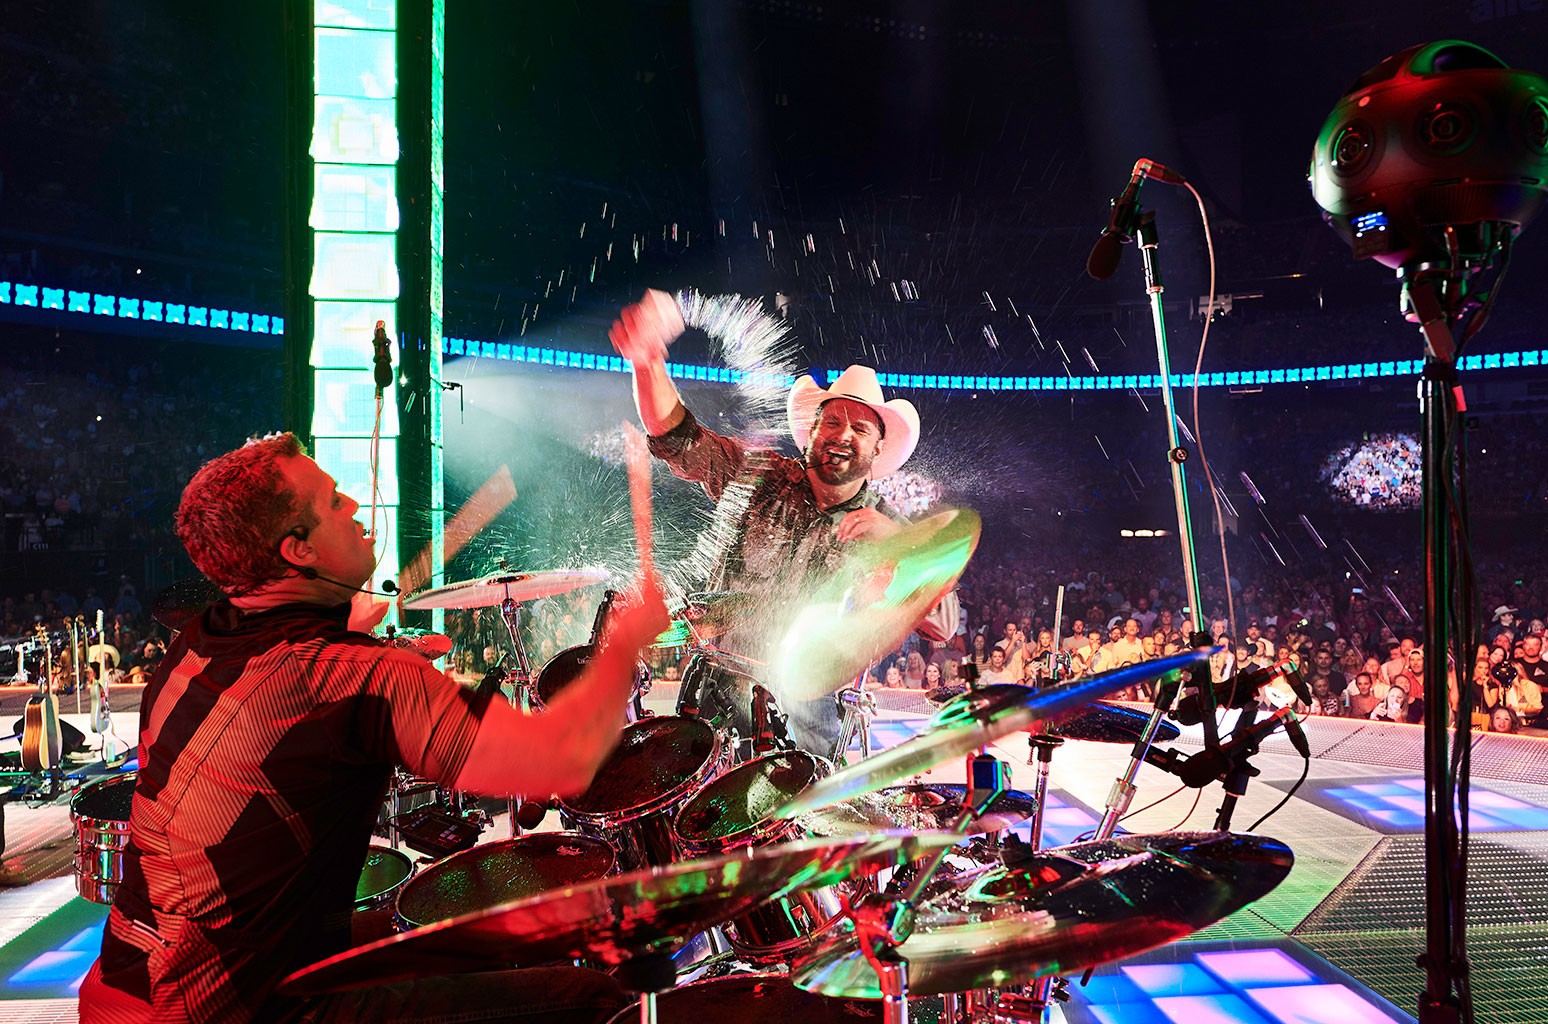 Stadium Concerts Are Back: Inside Garth Brooks' Huge Show at Las Vegas' 'Death Star'